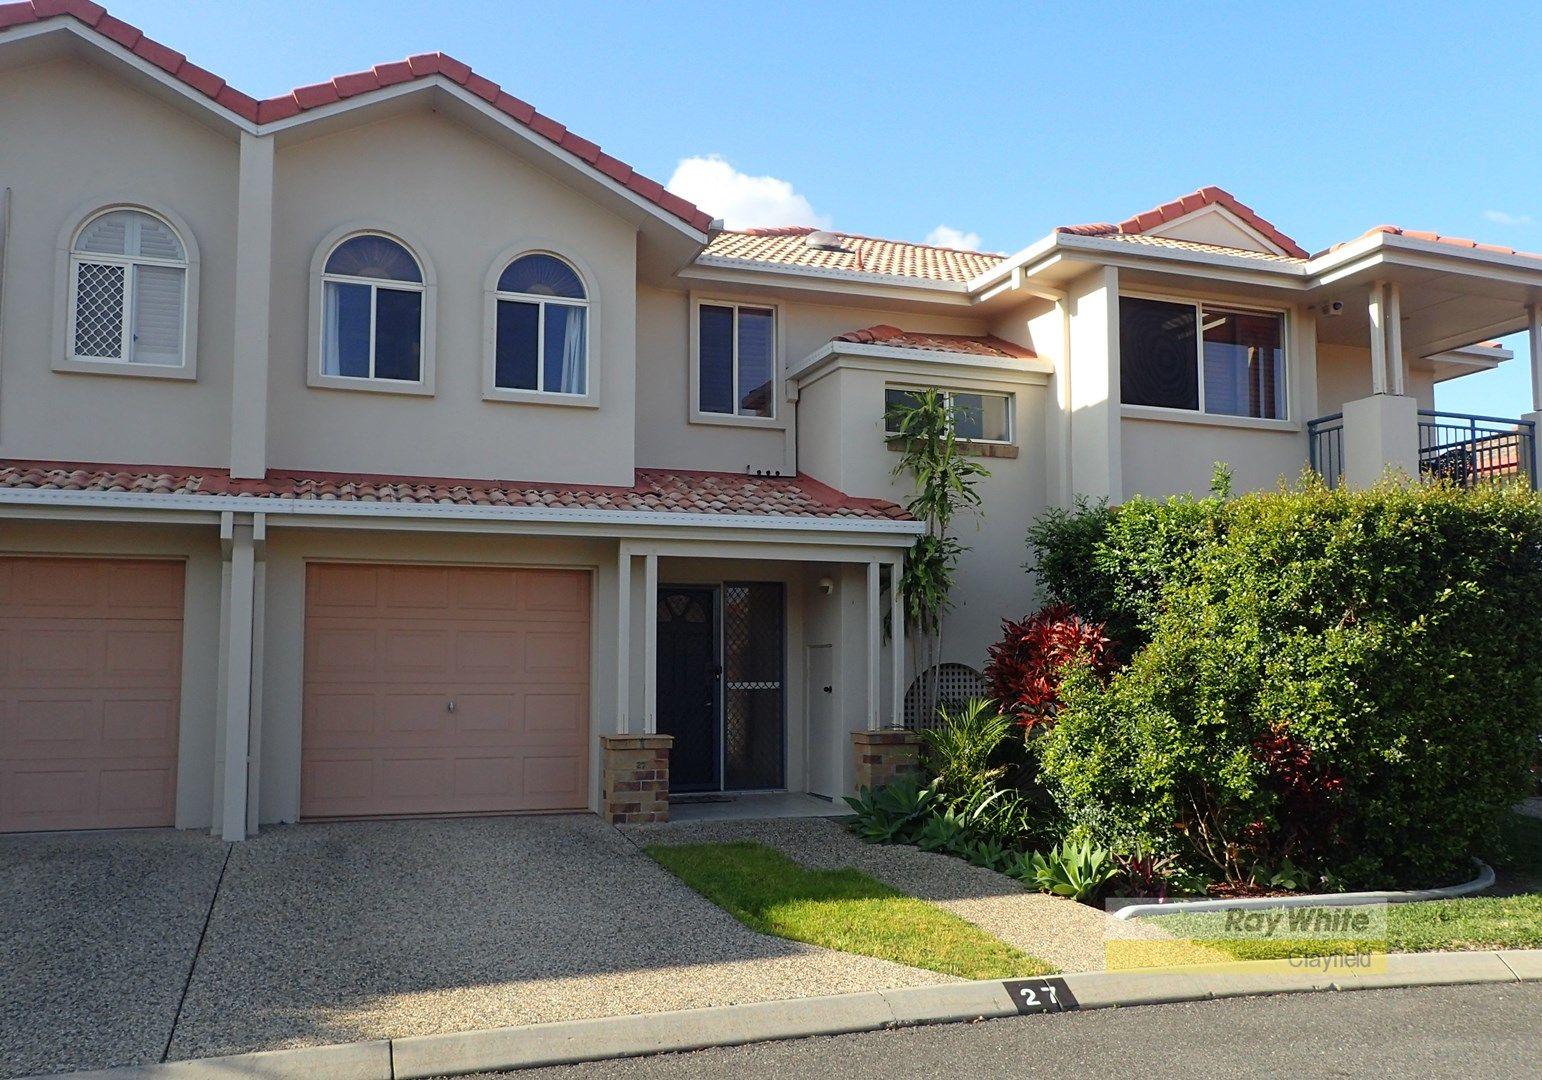 27/139 Pring Street, Hendra QLD 4011, Image 0